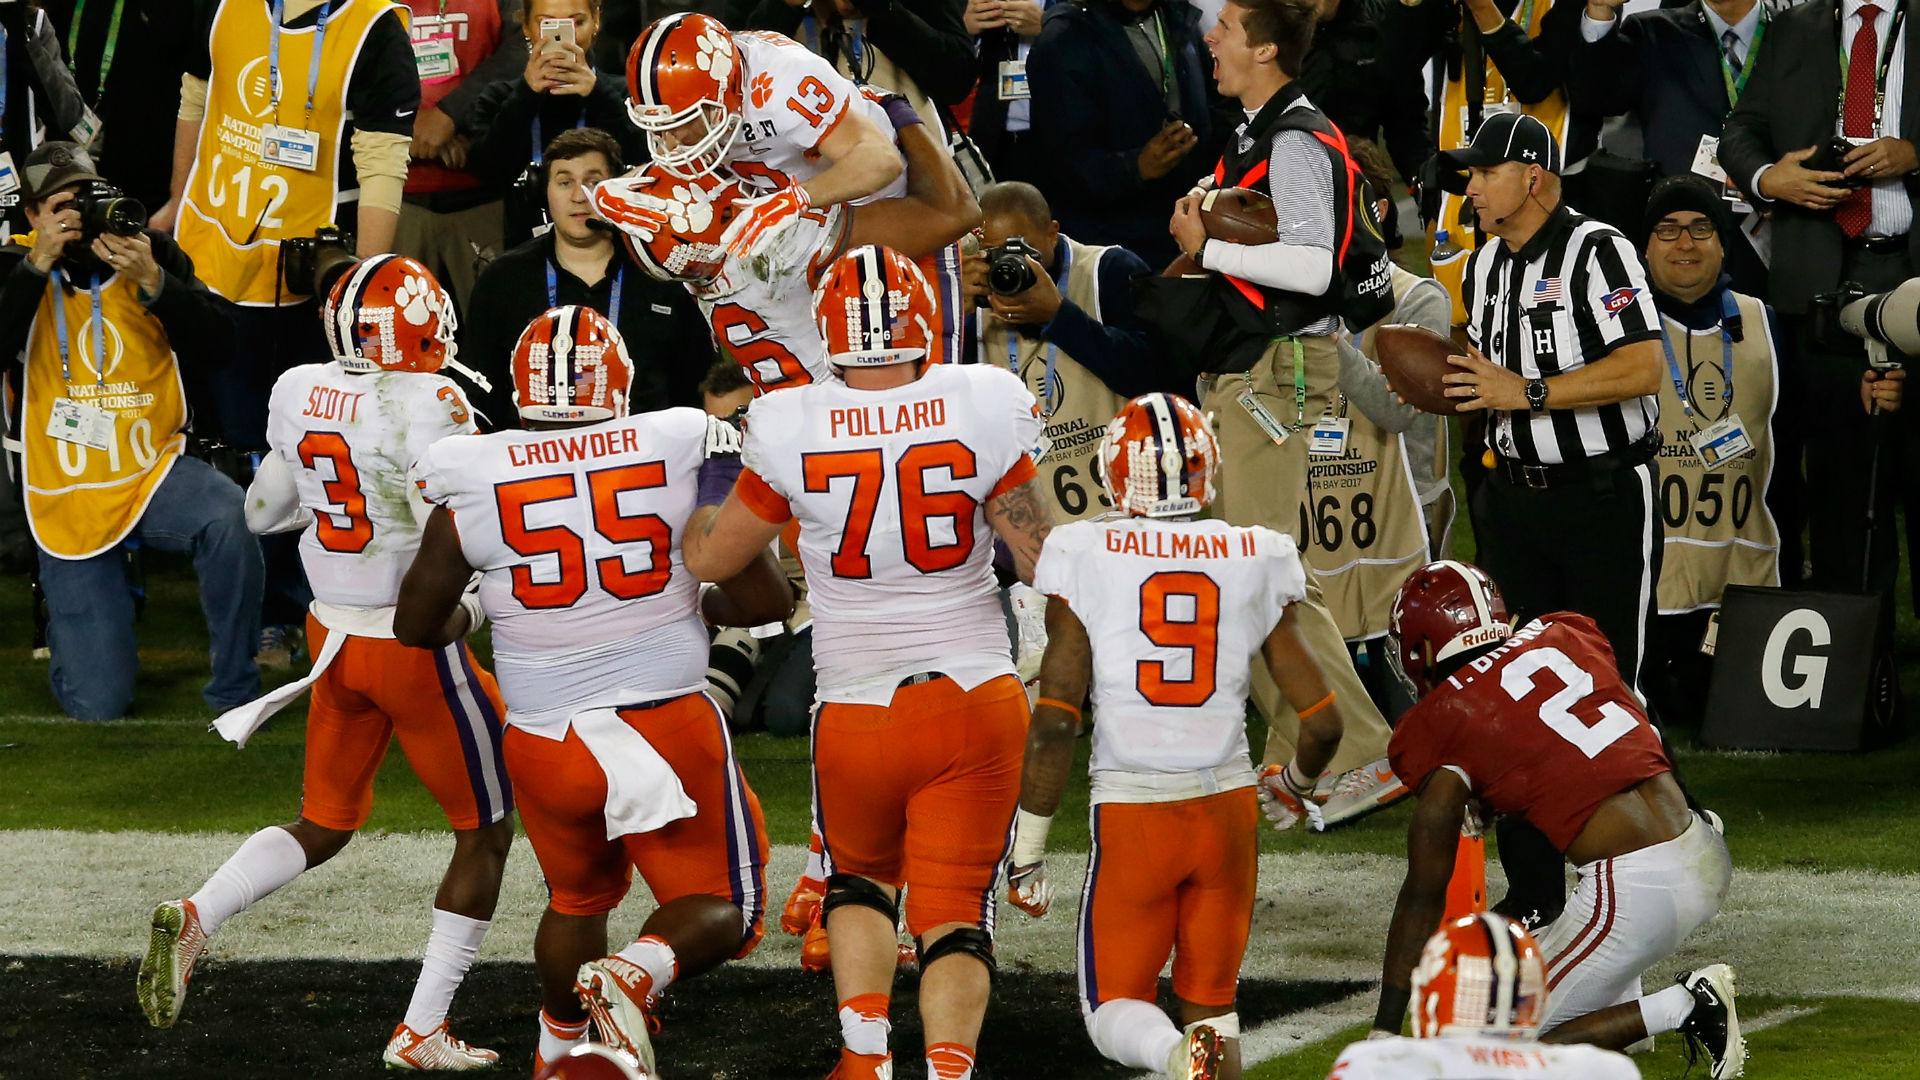 live college football score college football national championship score